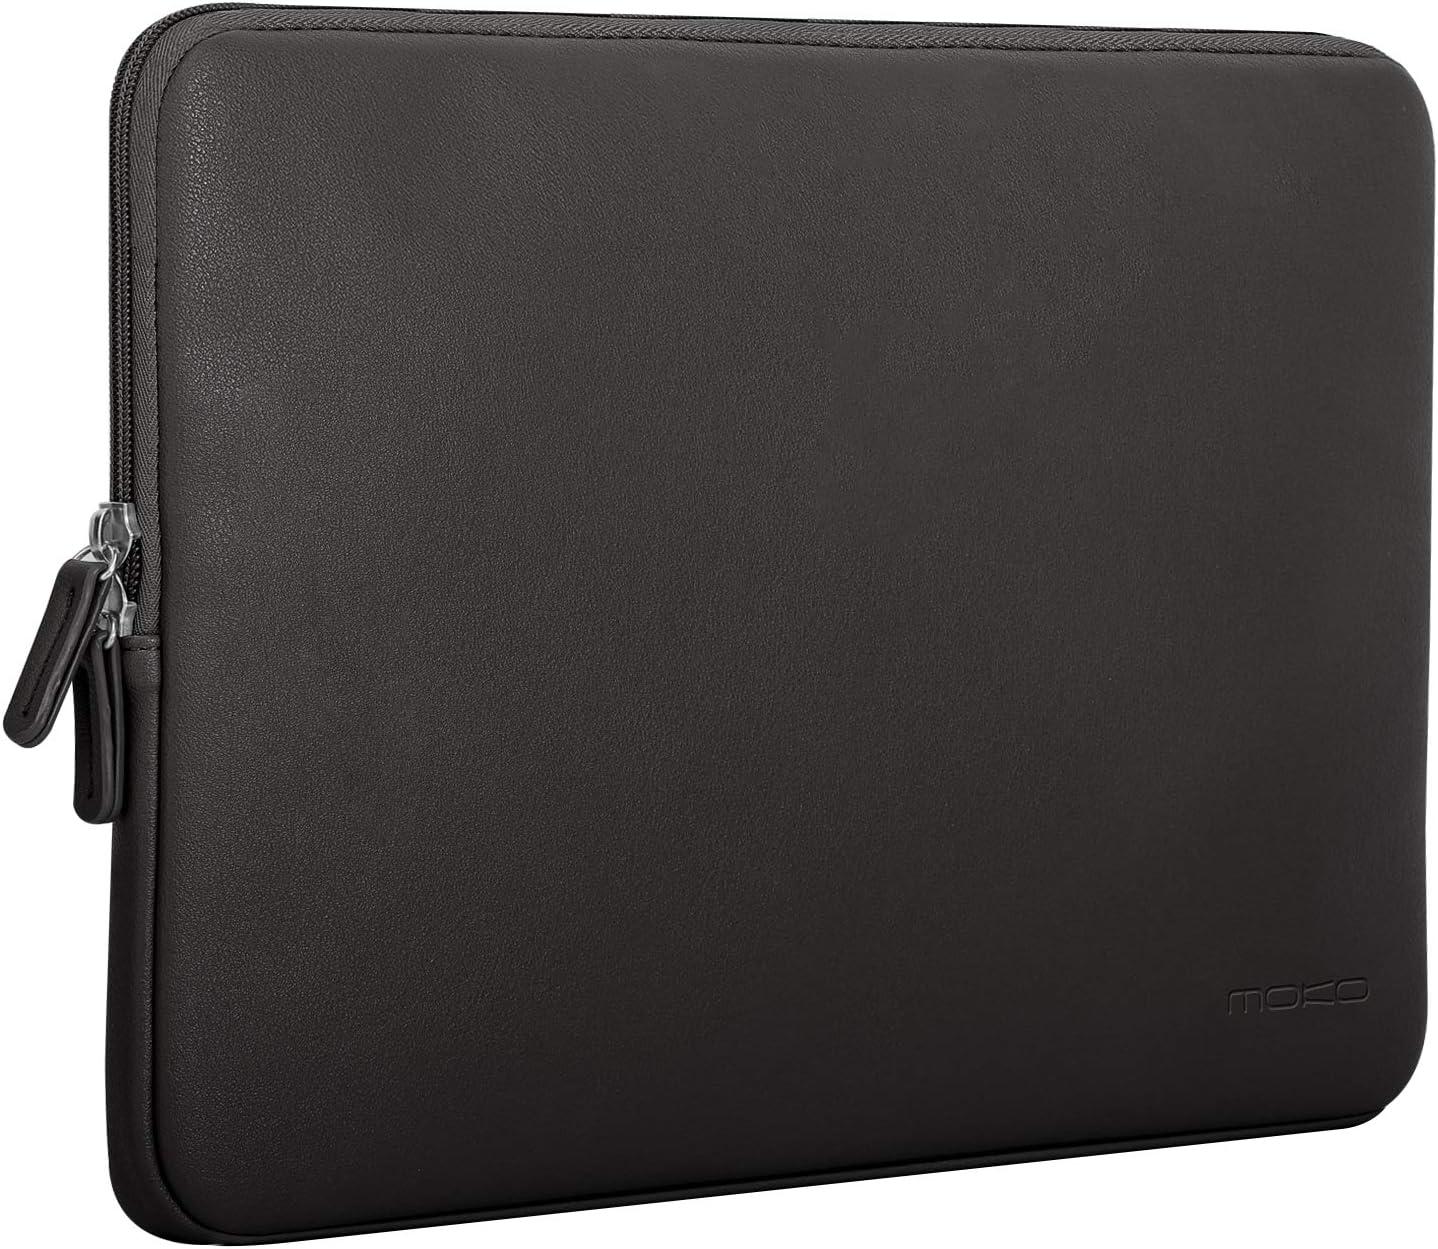 MoKo 13-13.3 Inch Laptop Sleeve Bag Fits MacBook Air 13-inch Retina 2020-2016, MacBook Pro 13